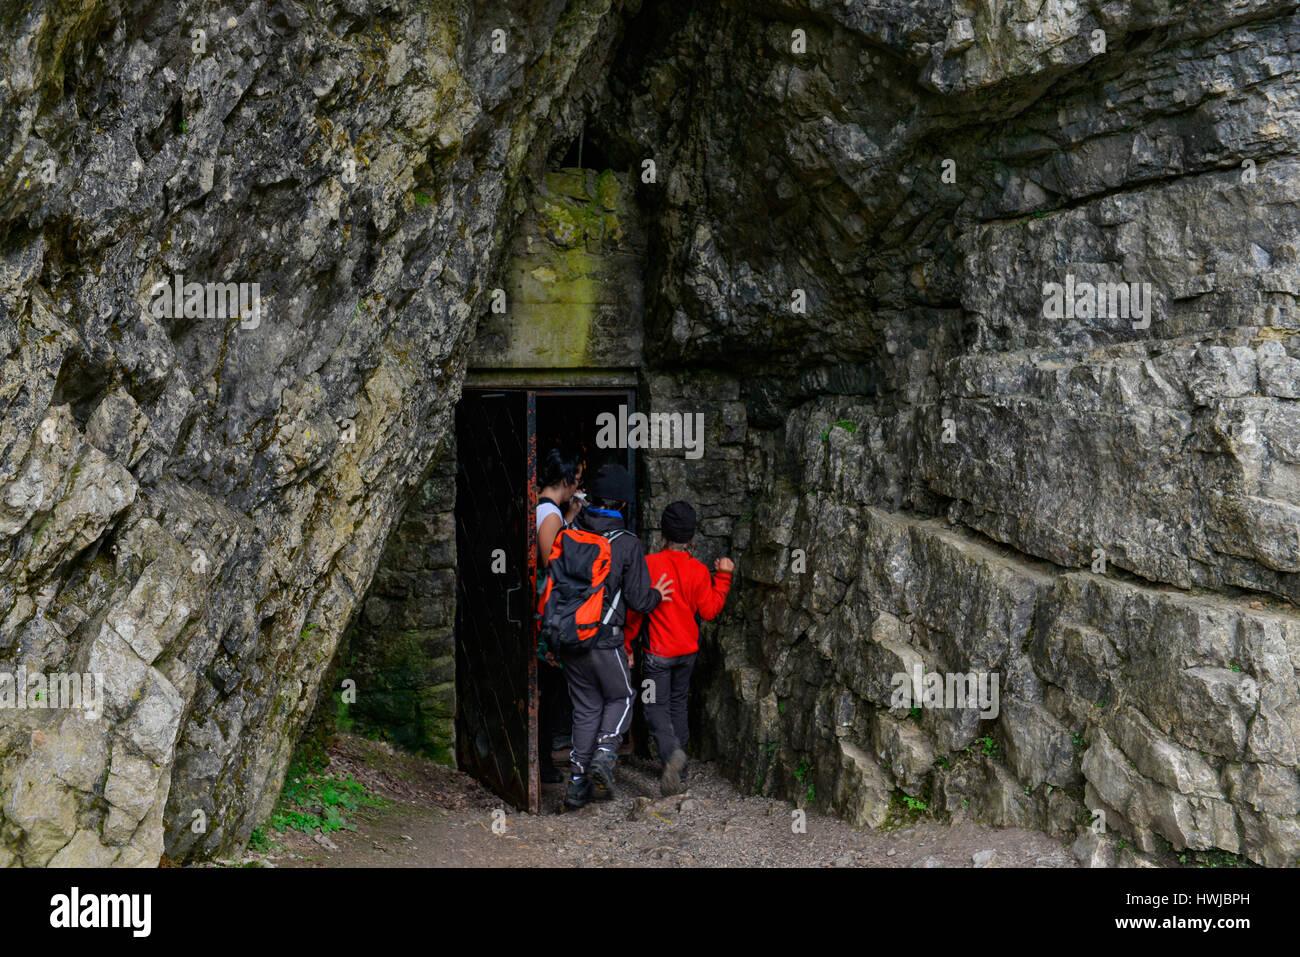 Hoehle Jaskinia Mrozna, Dolina Koscieliska, Hohe Tatra, Polen - Stock Image